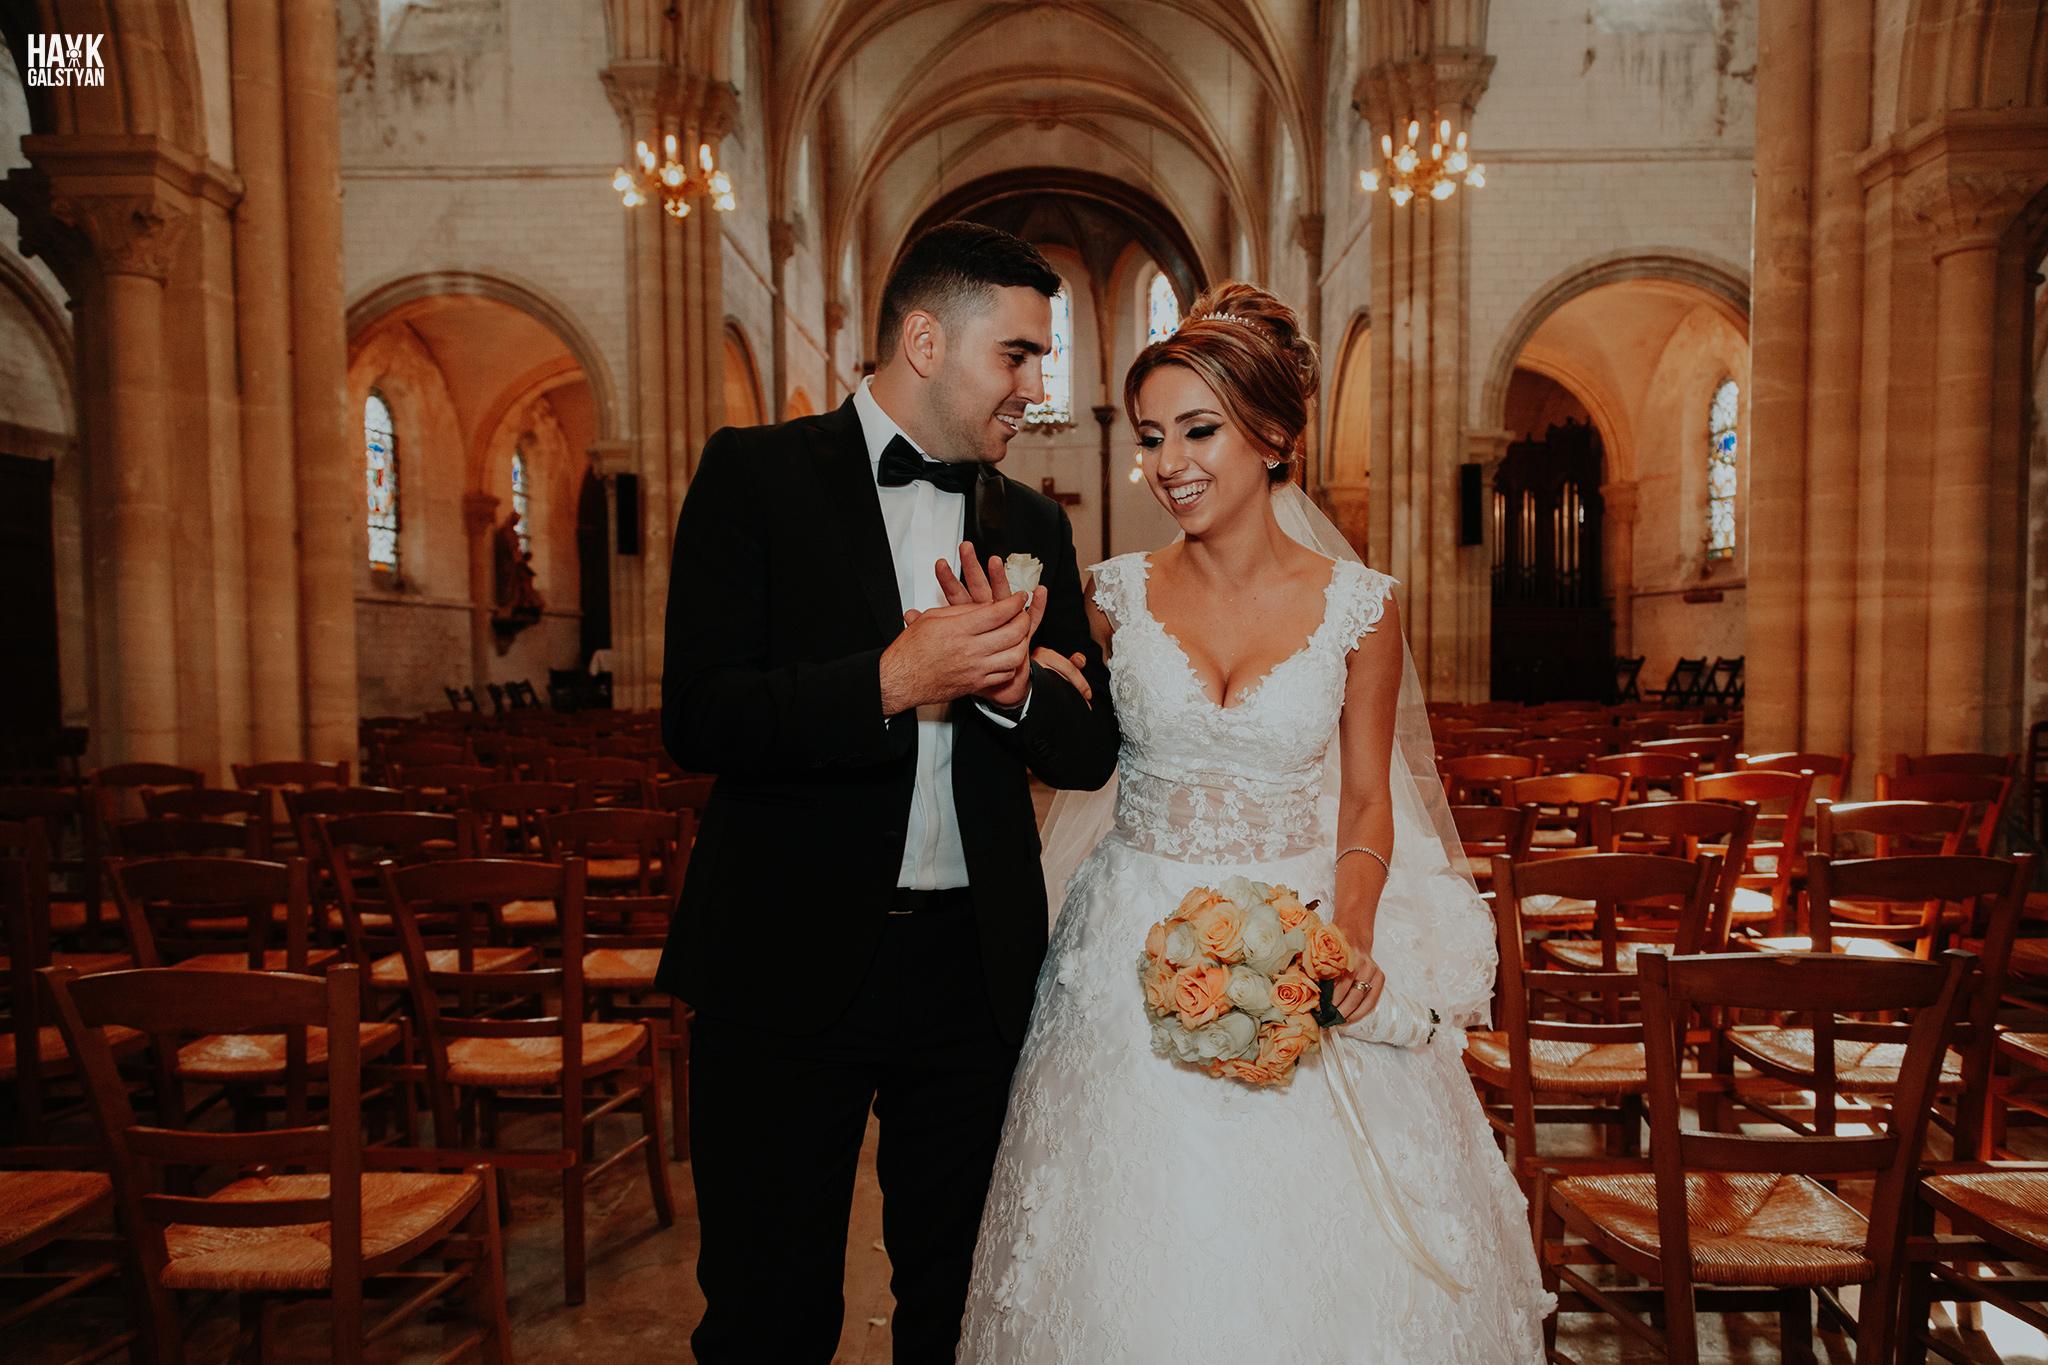 Luxury wedding photographer in Paris Hayk Galstyan